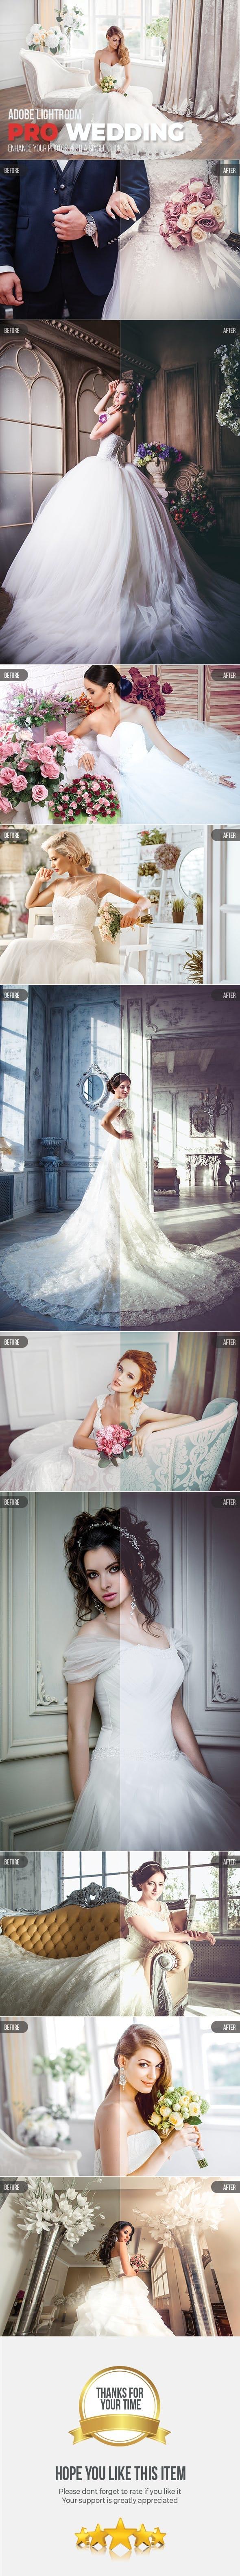 10 Pro Wedding Lightroom Presets - Wedding Lightroom Presets